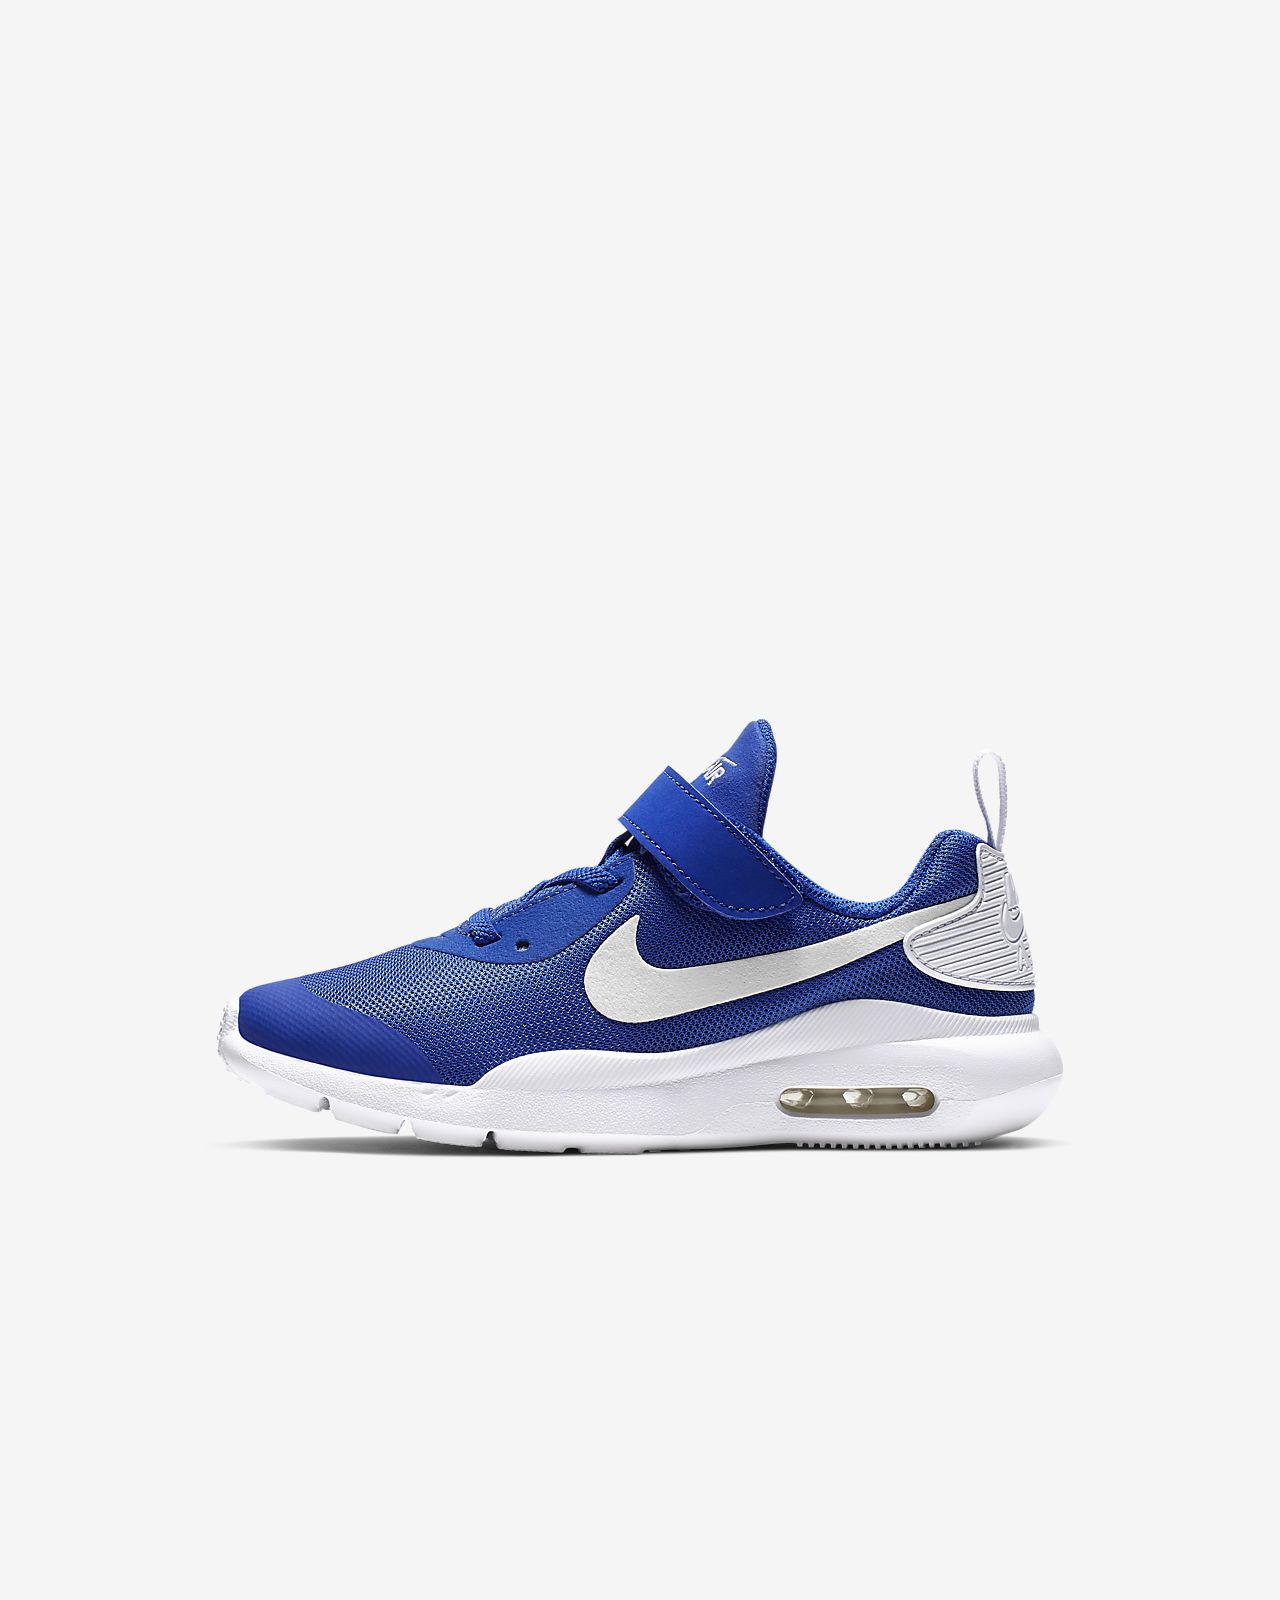 25234c692ebf Nike Air Max Oketo Little Kids  Shoe. Nike.com